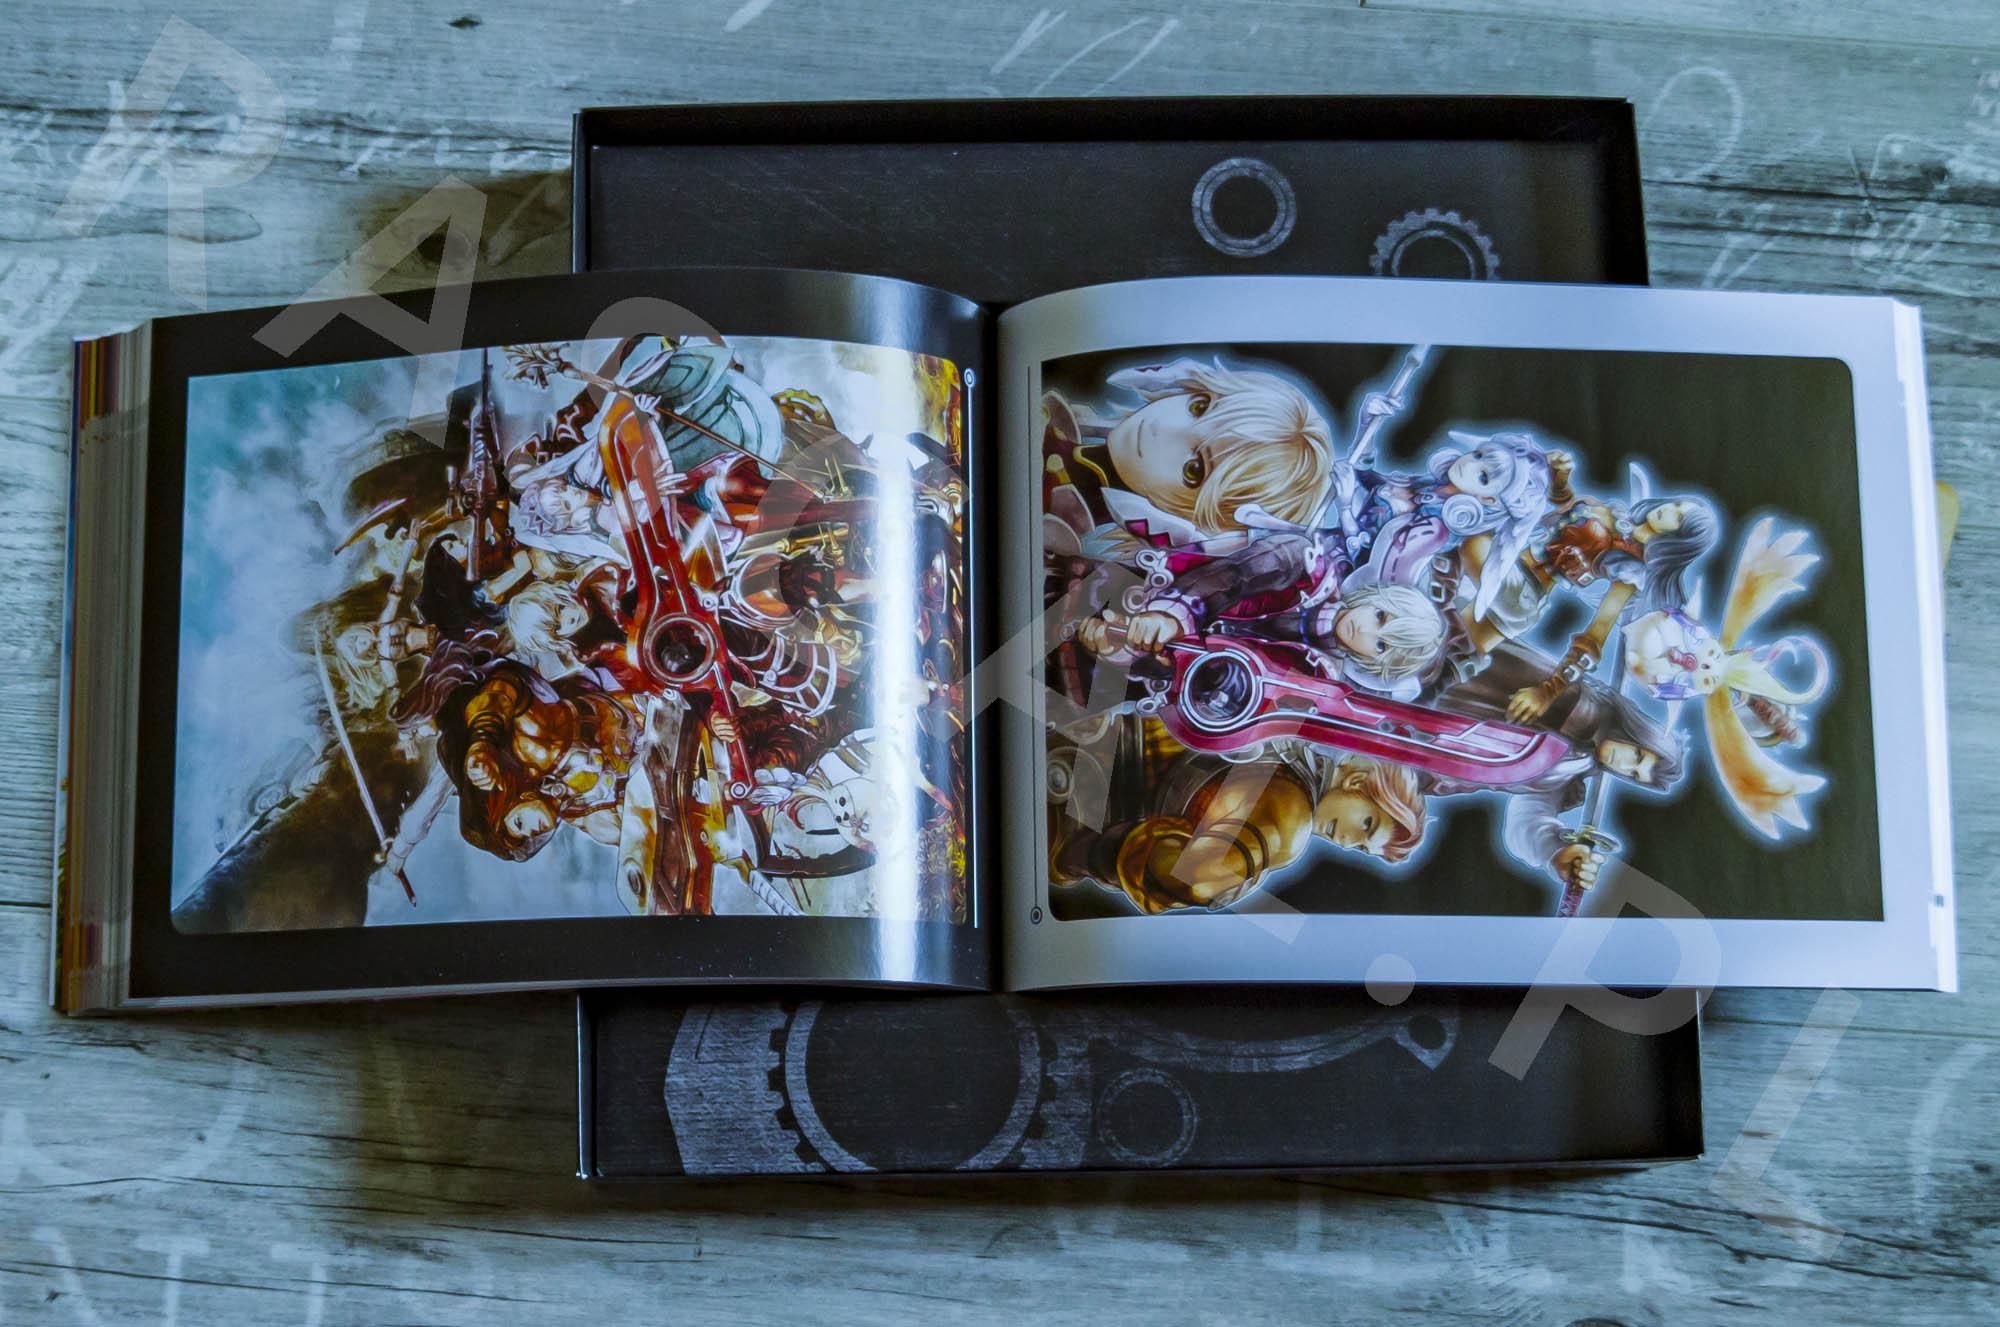 Xenoblade Chronicles Definitive Edition Collectors Set - Artbook - 24